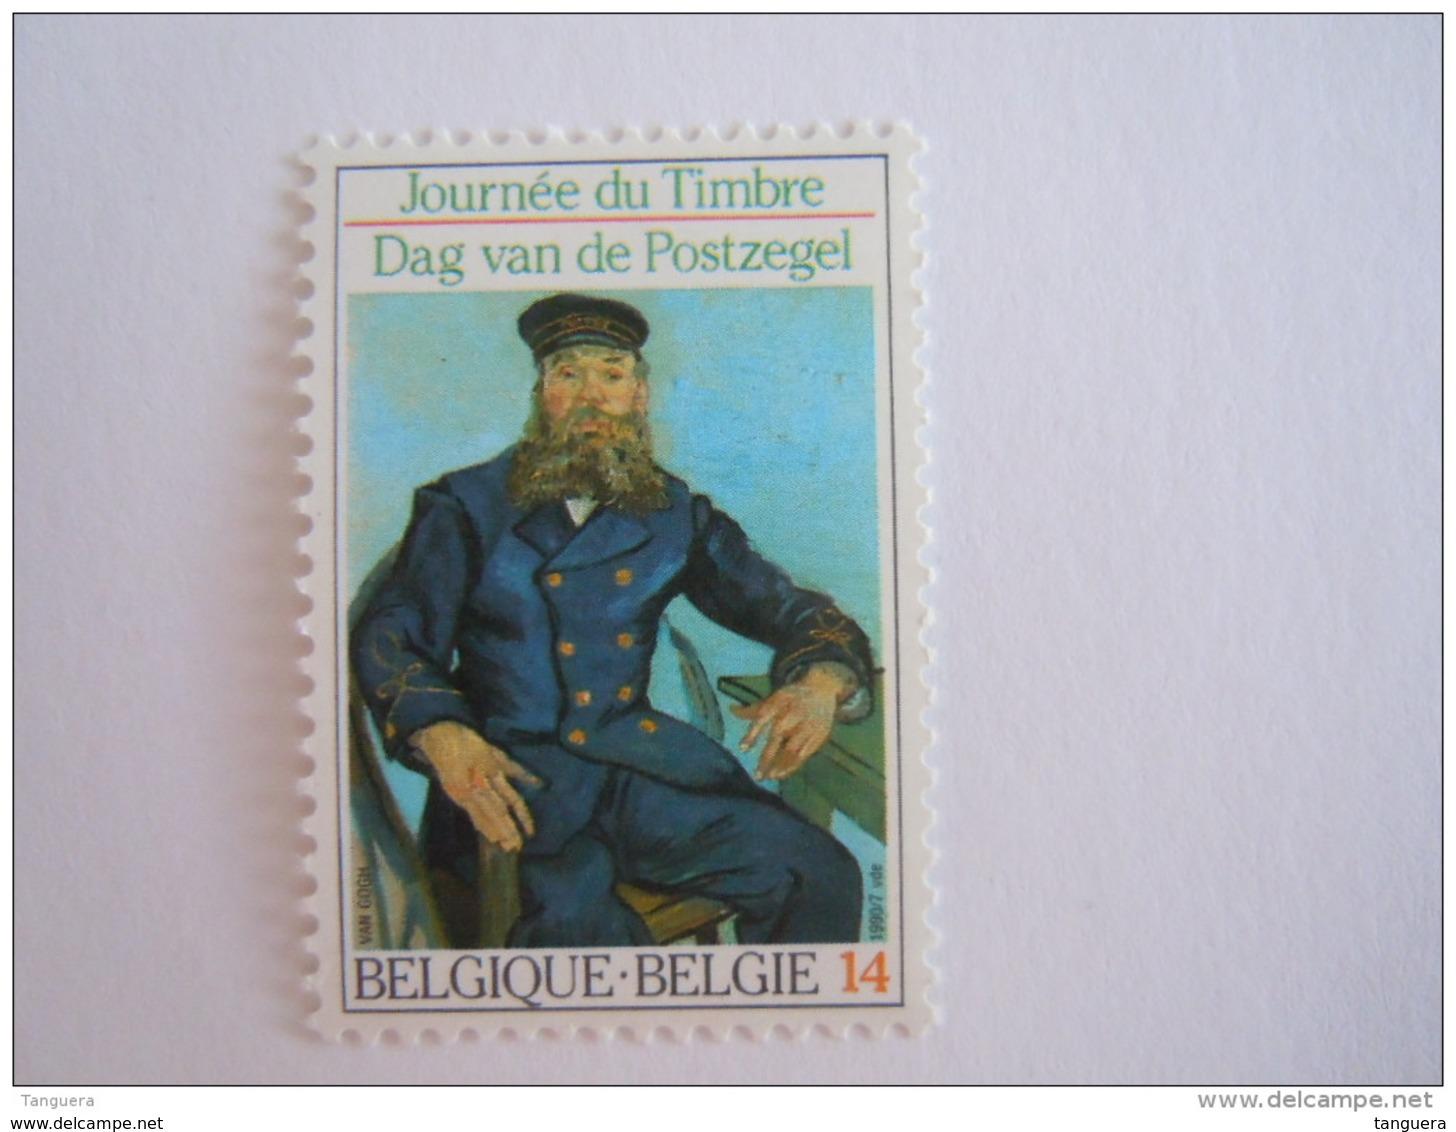 België Belgique 1990 Postbode,facteur Roulin Journée Du Timbre COB Yv 2365 MNH ** - Stamp's Day